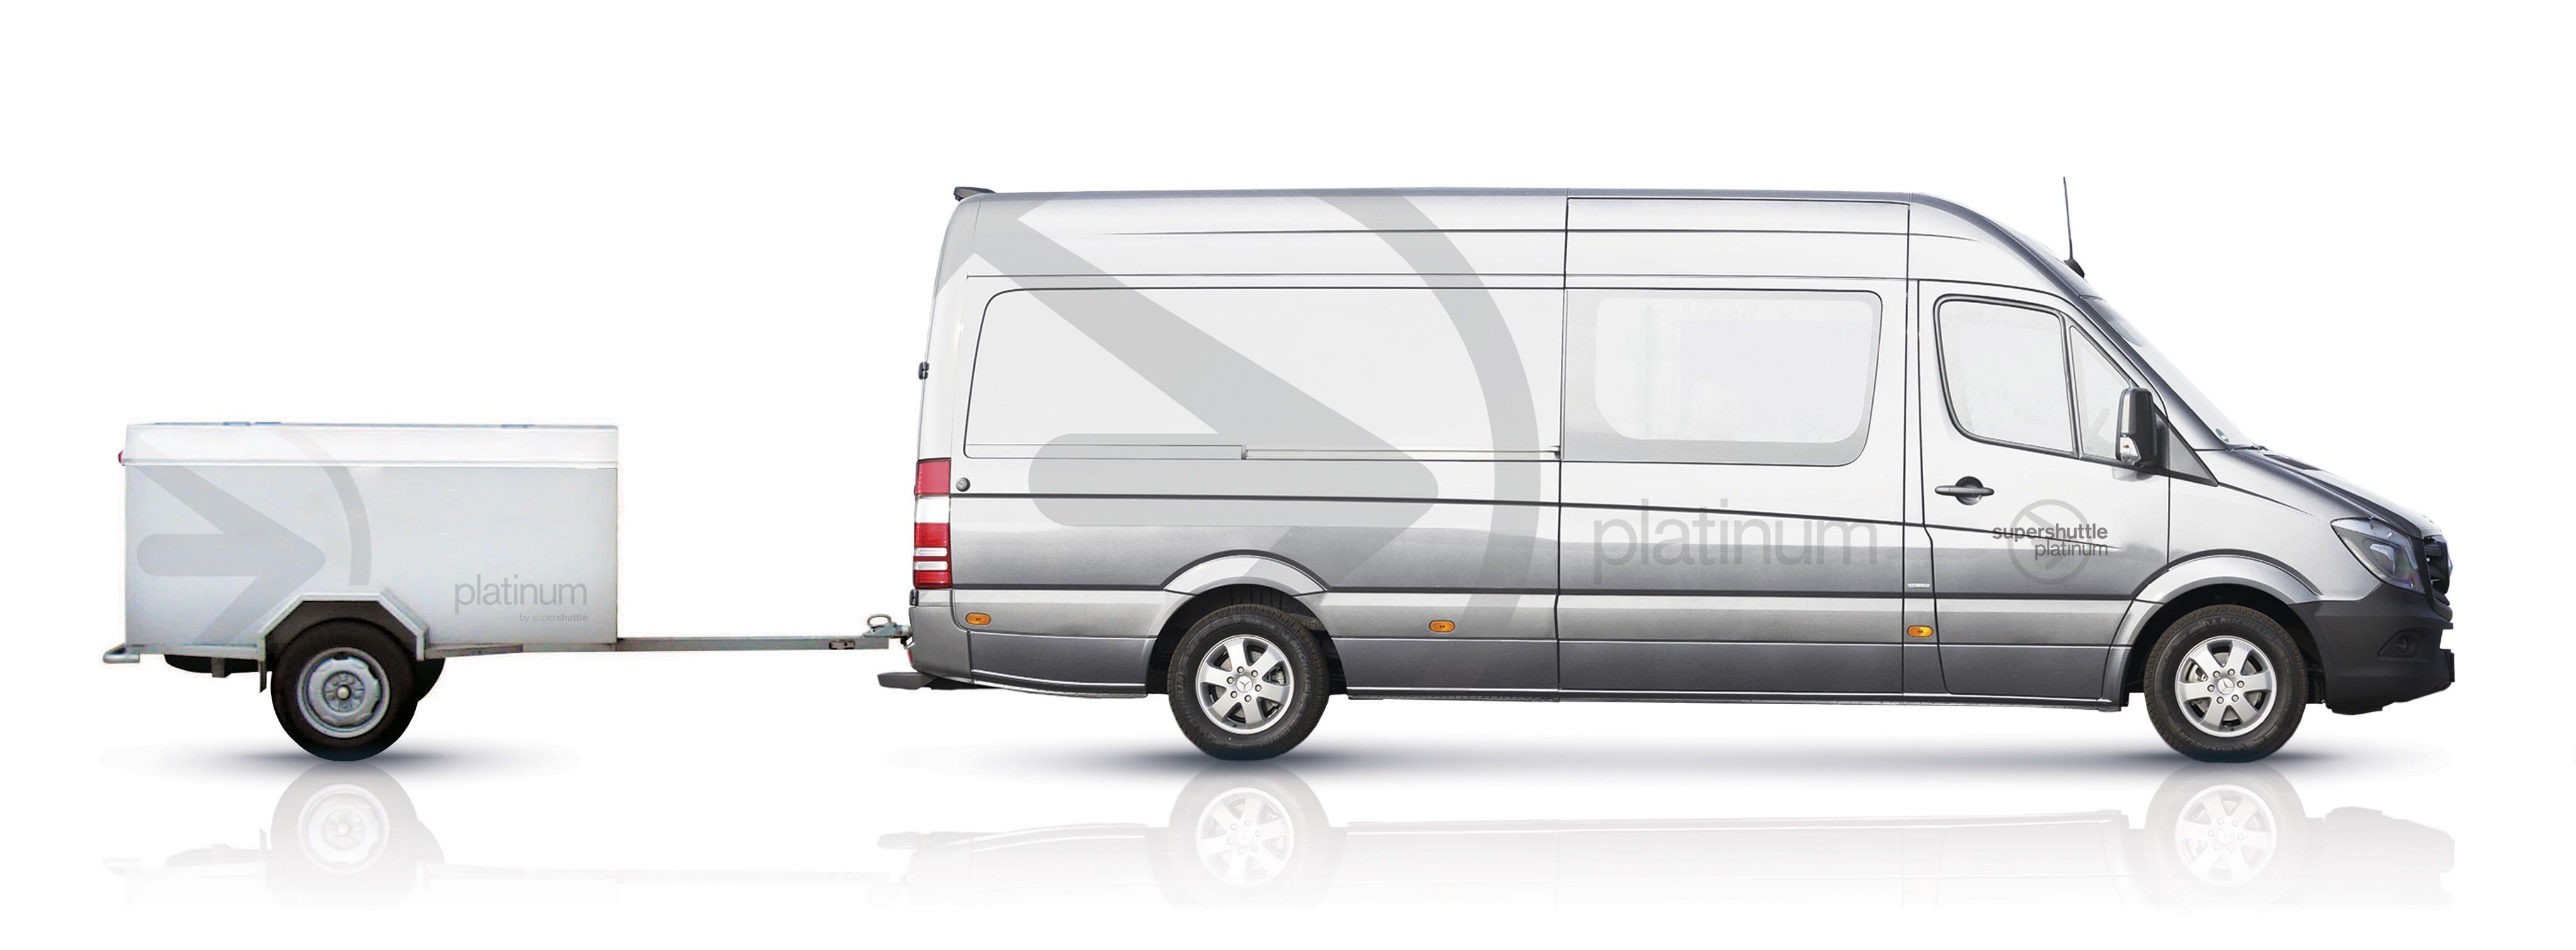 Platinum by Super Shuttle vehicle 1